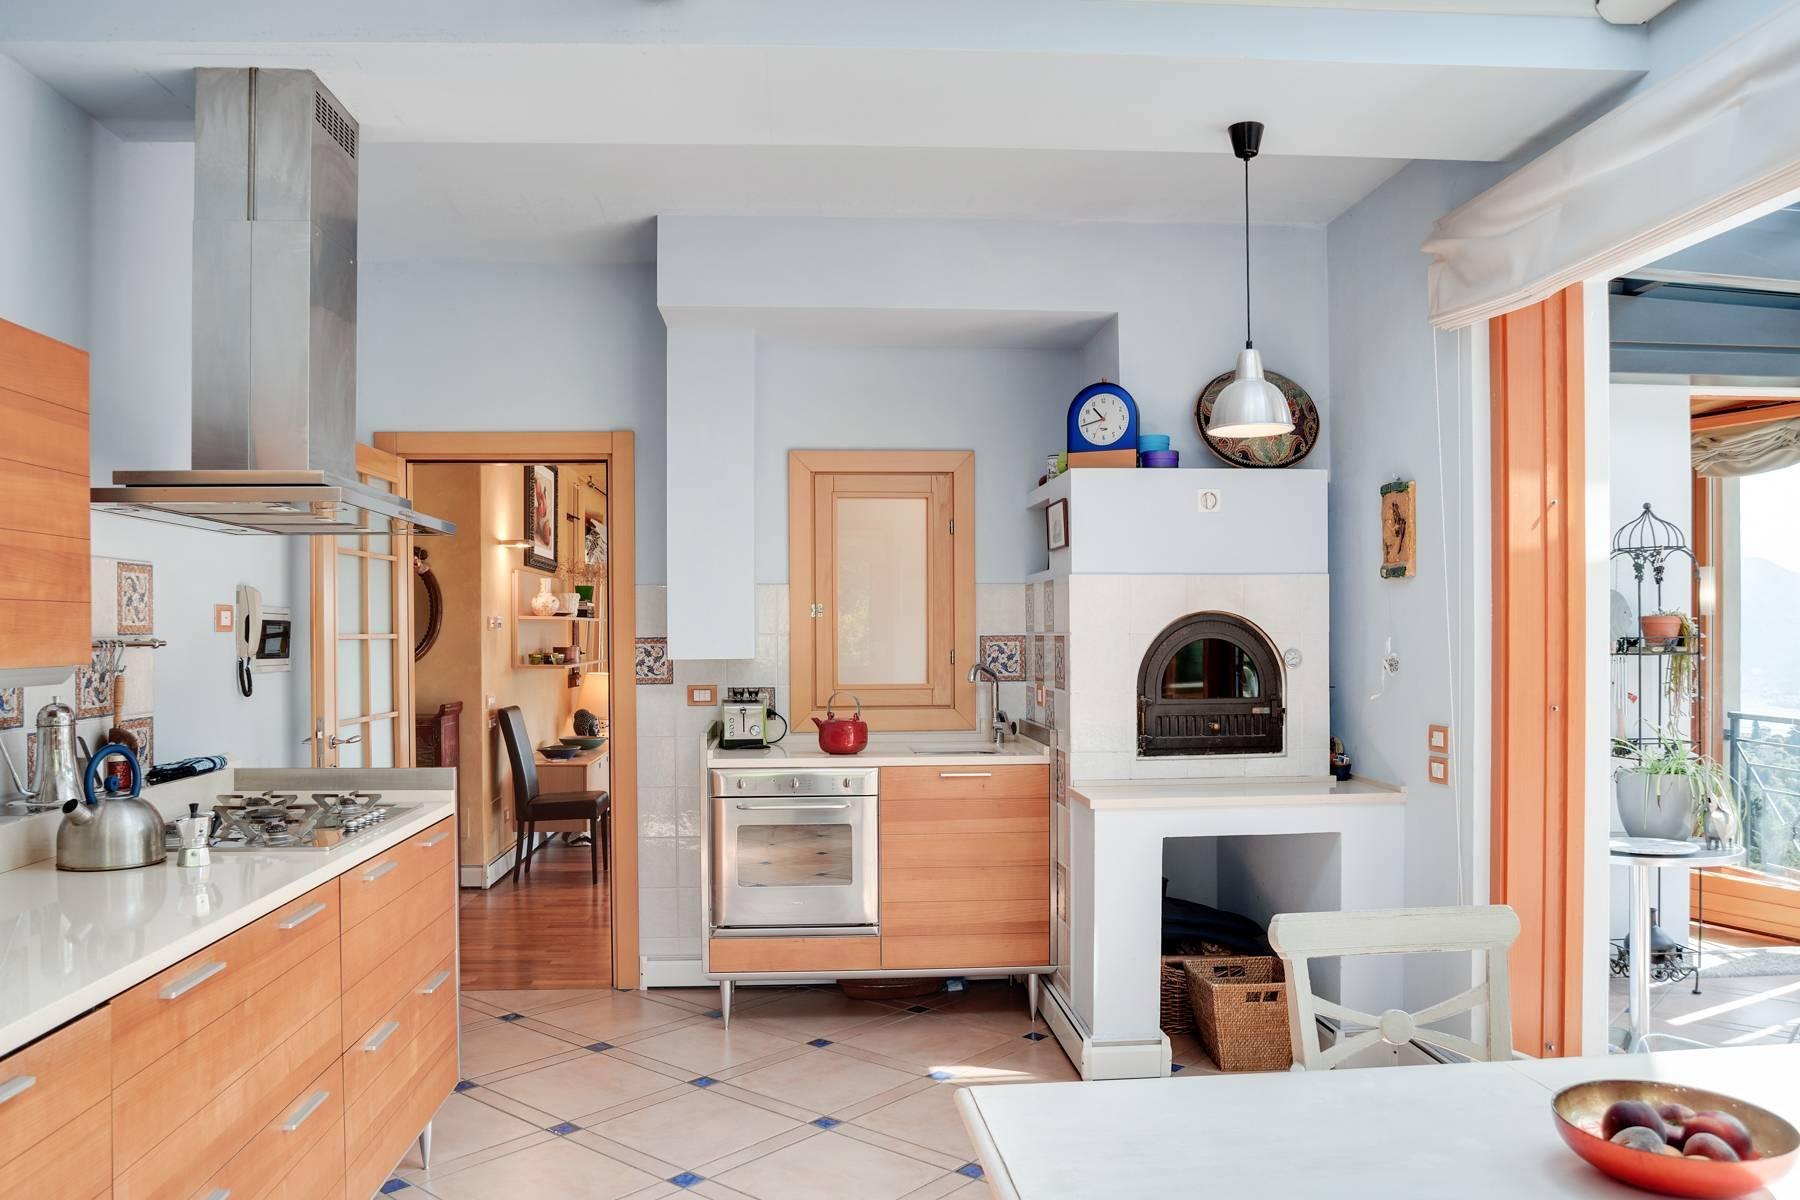 Splendida villa moderna sulla collina soleggiata sopra Argegno - 22